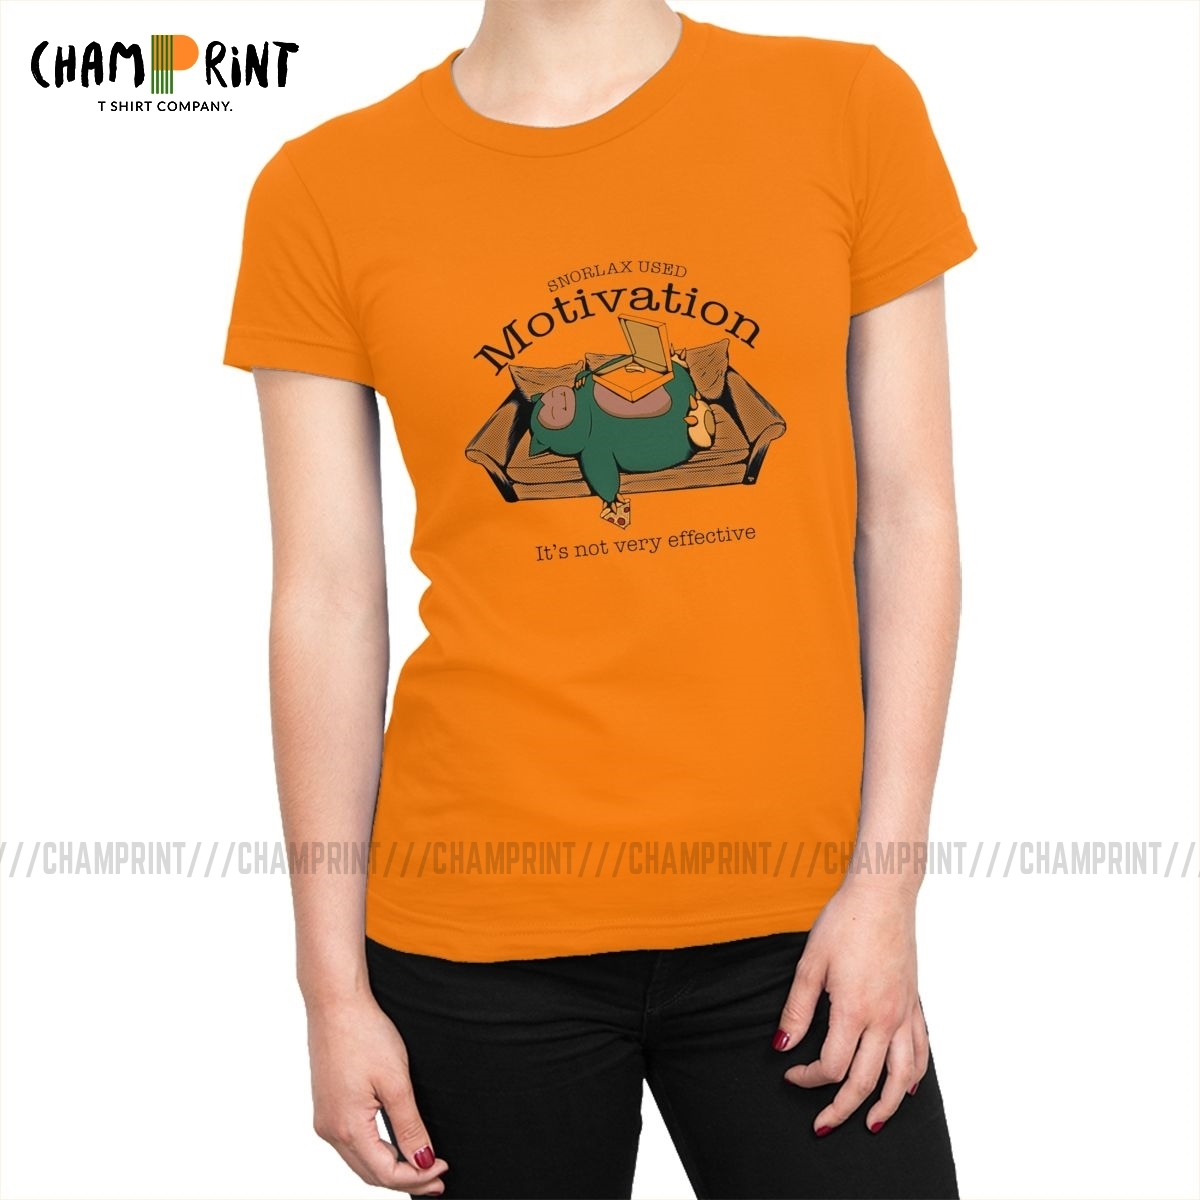 women-snorlax-used-motivation-t-shirt-font-b-pokemon-b-font-anime-tshirt-fashion-100-cotton-tops-tees-novelty-female-clothing-printed-graphic